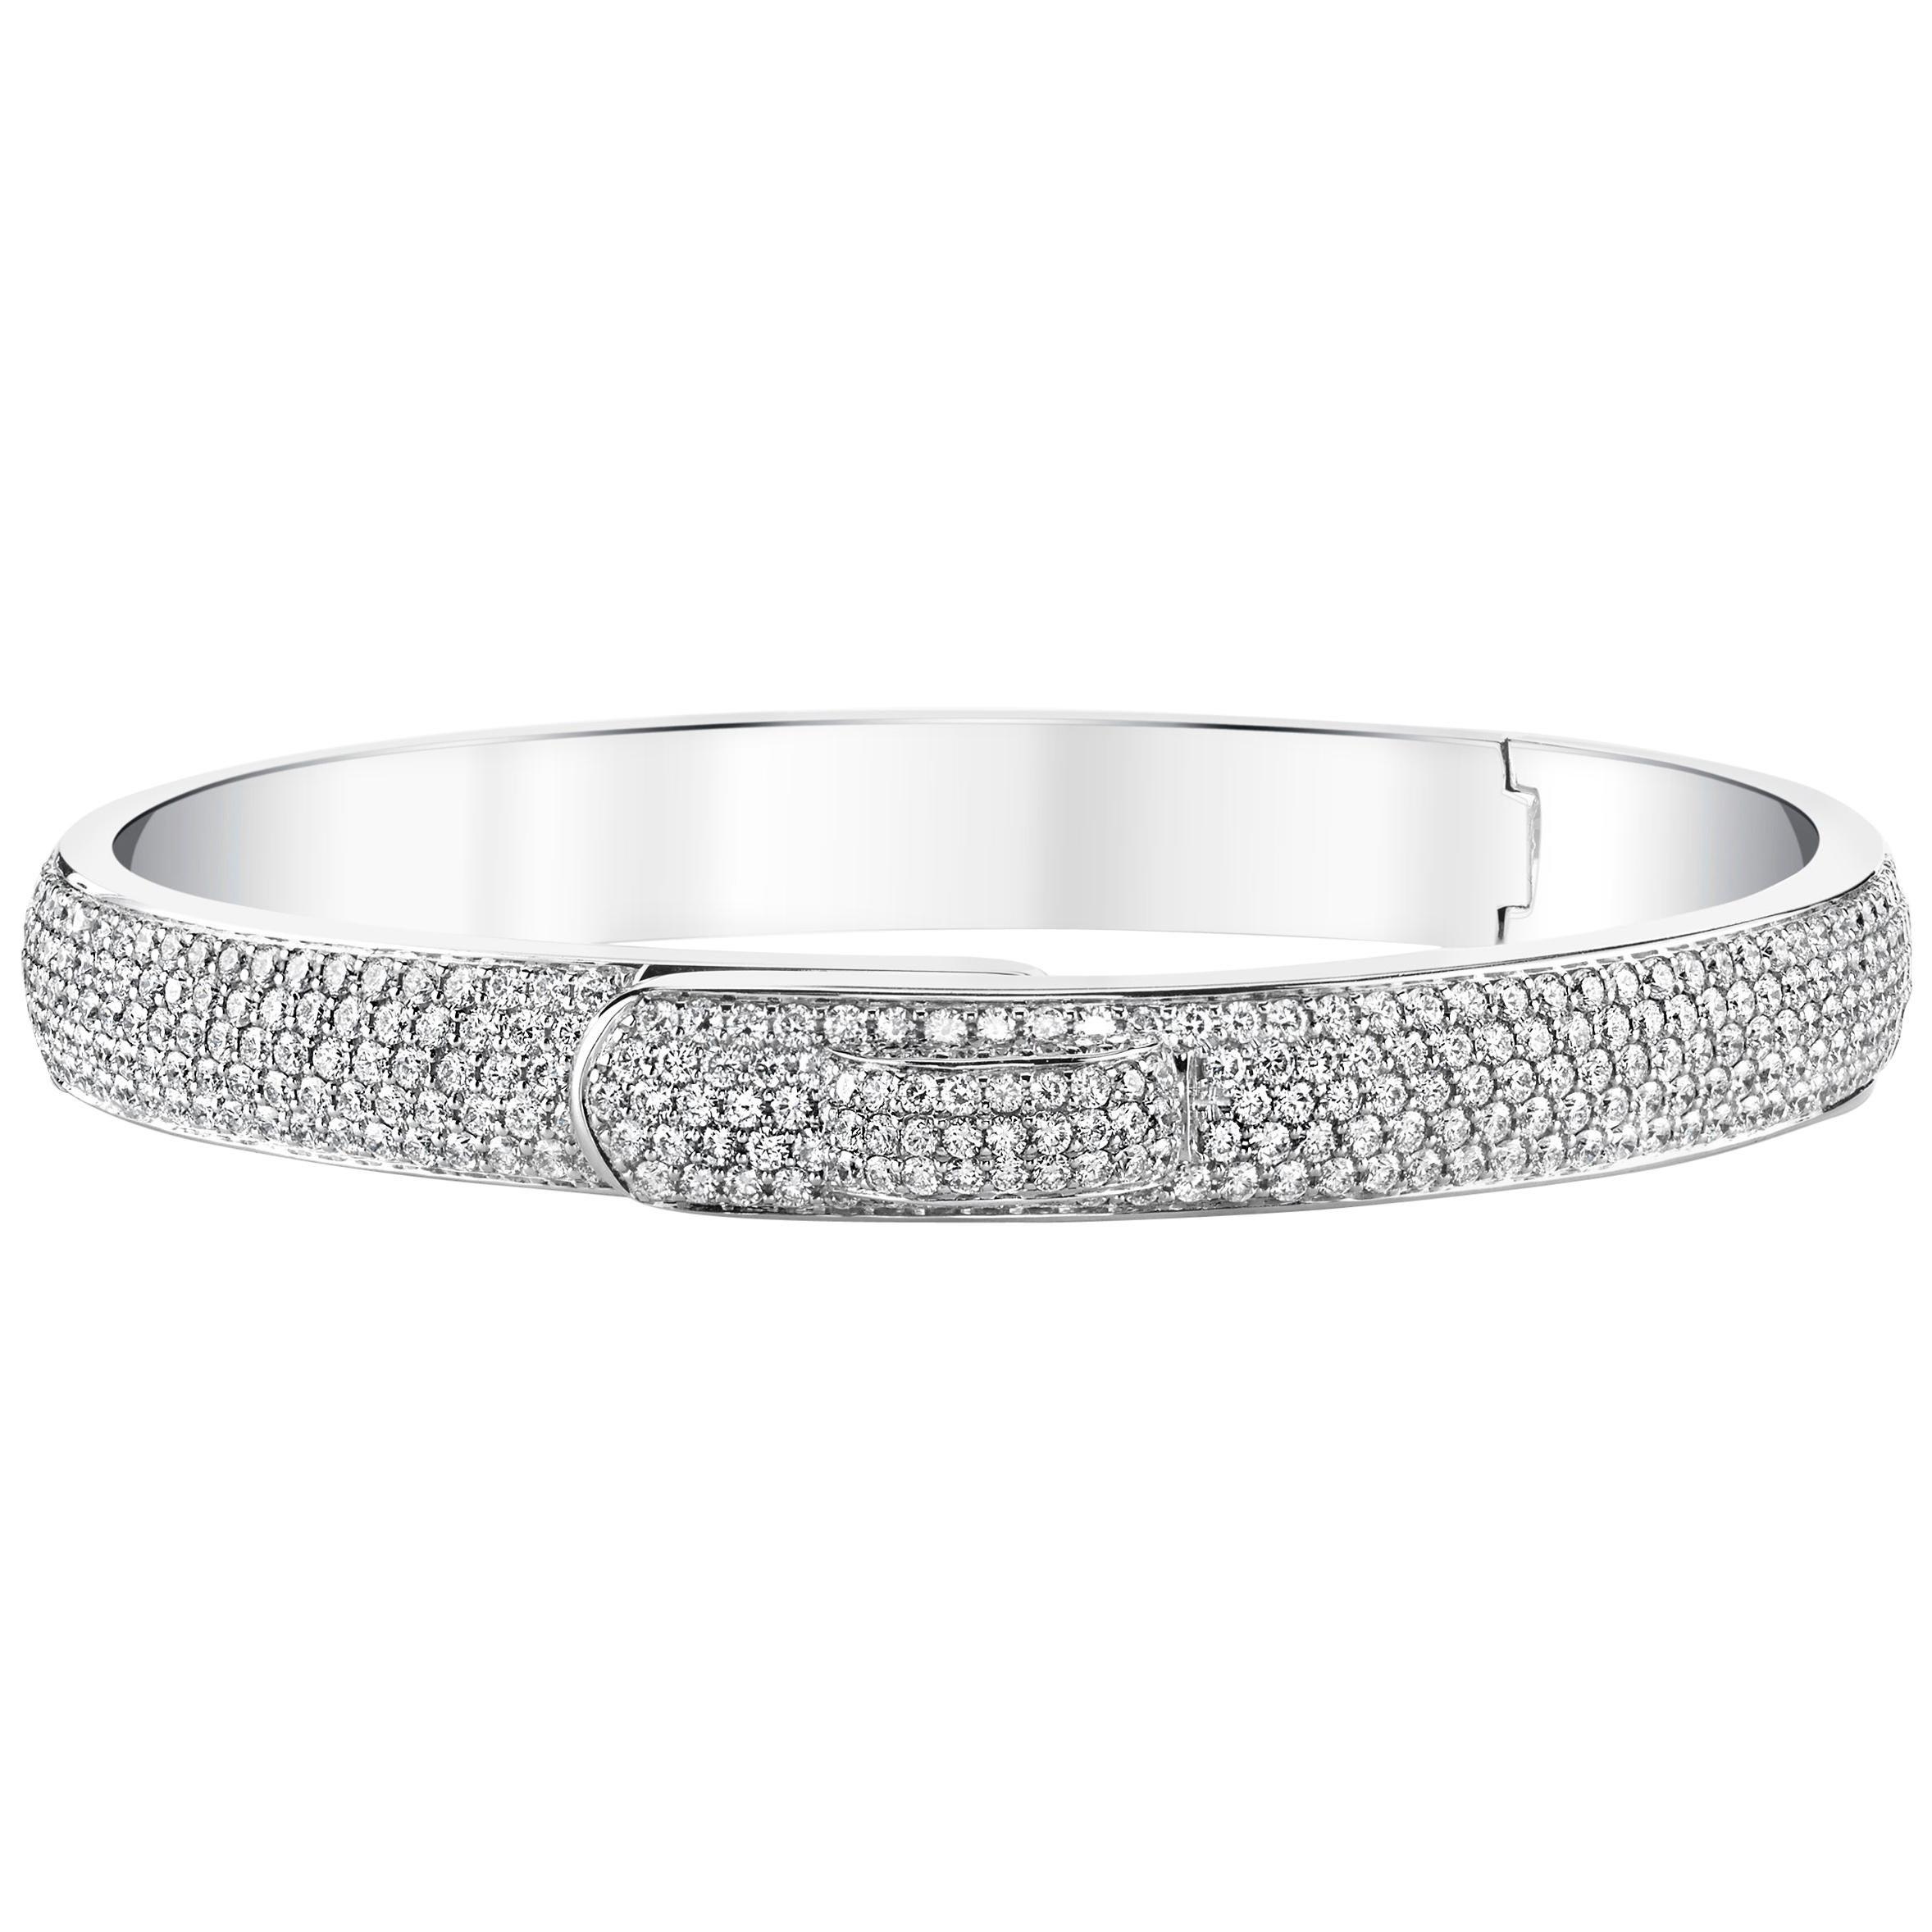 4.54 Carat Pavé Round Diamond 18 Karat White Gold Bangle Bracelet